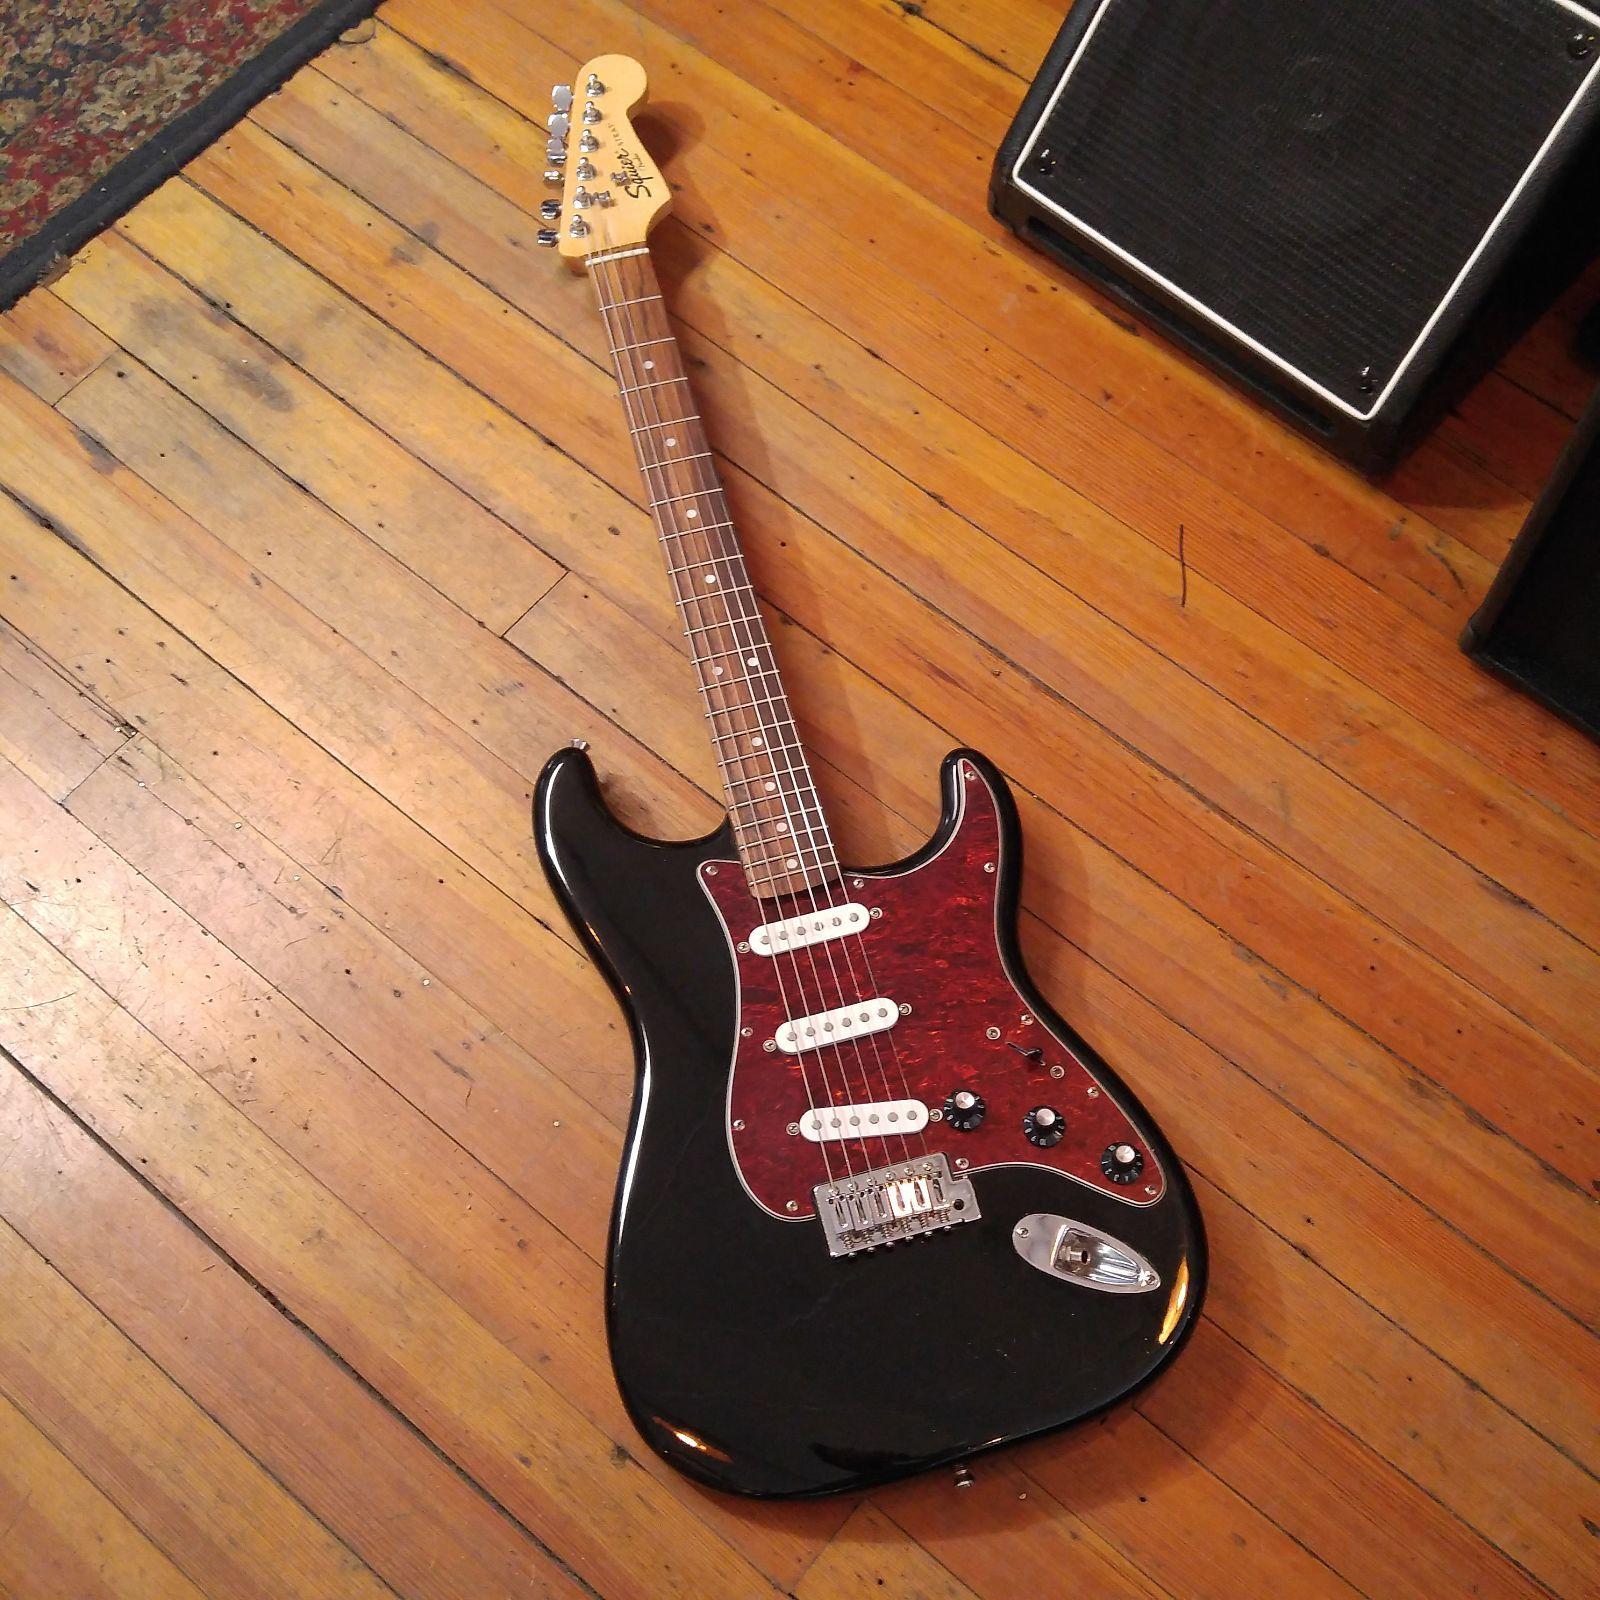 Squier Stratocaster Frontman Custom Black Squier Used Guitars Guitar